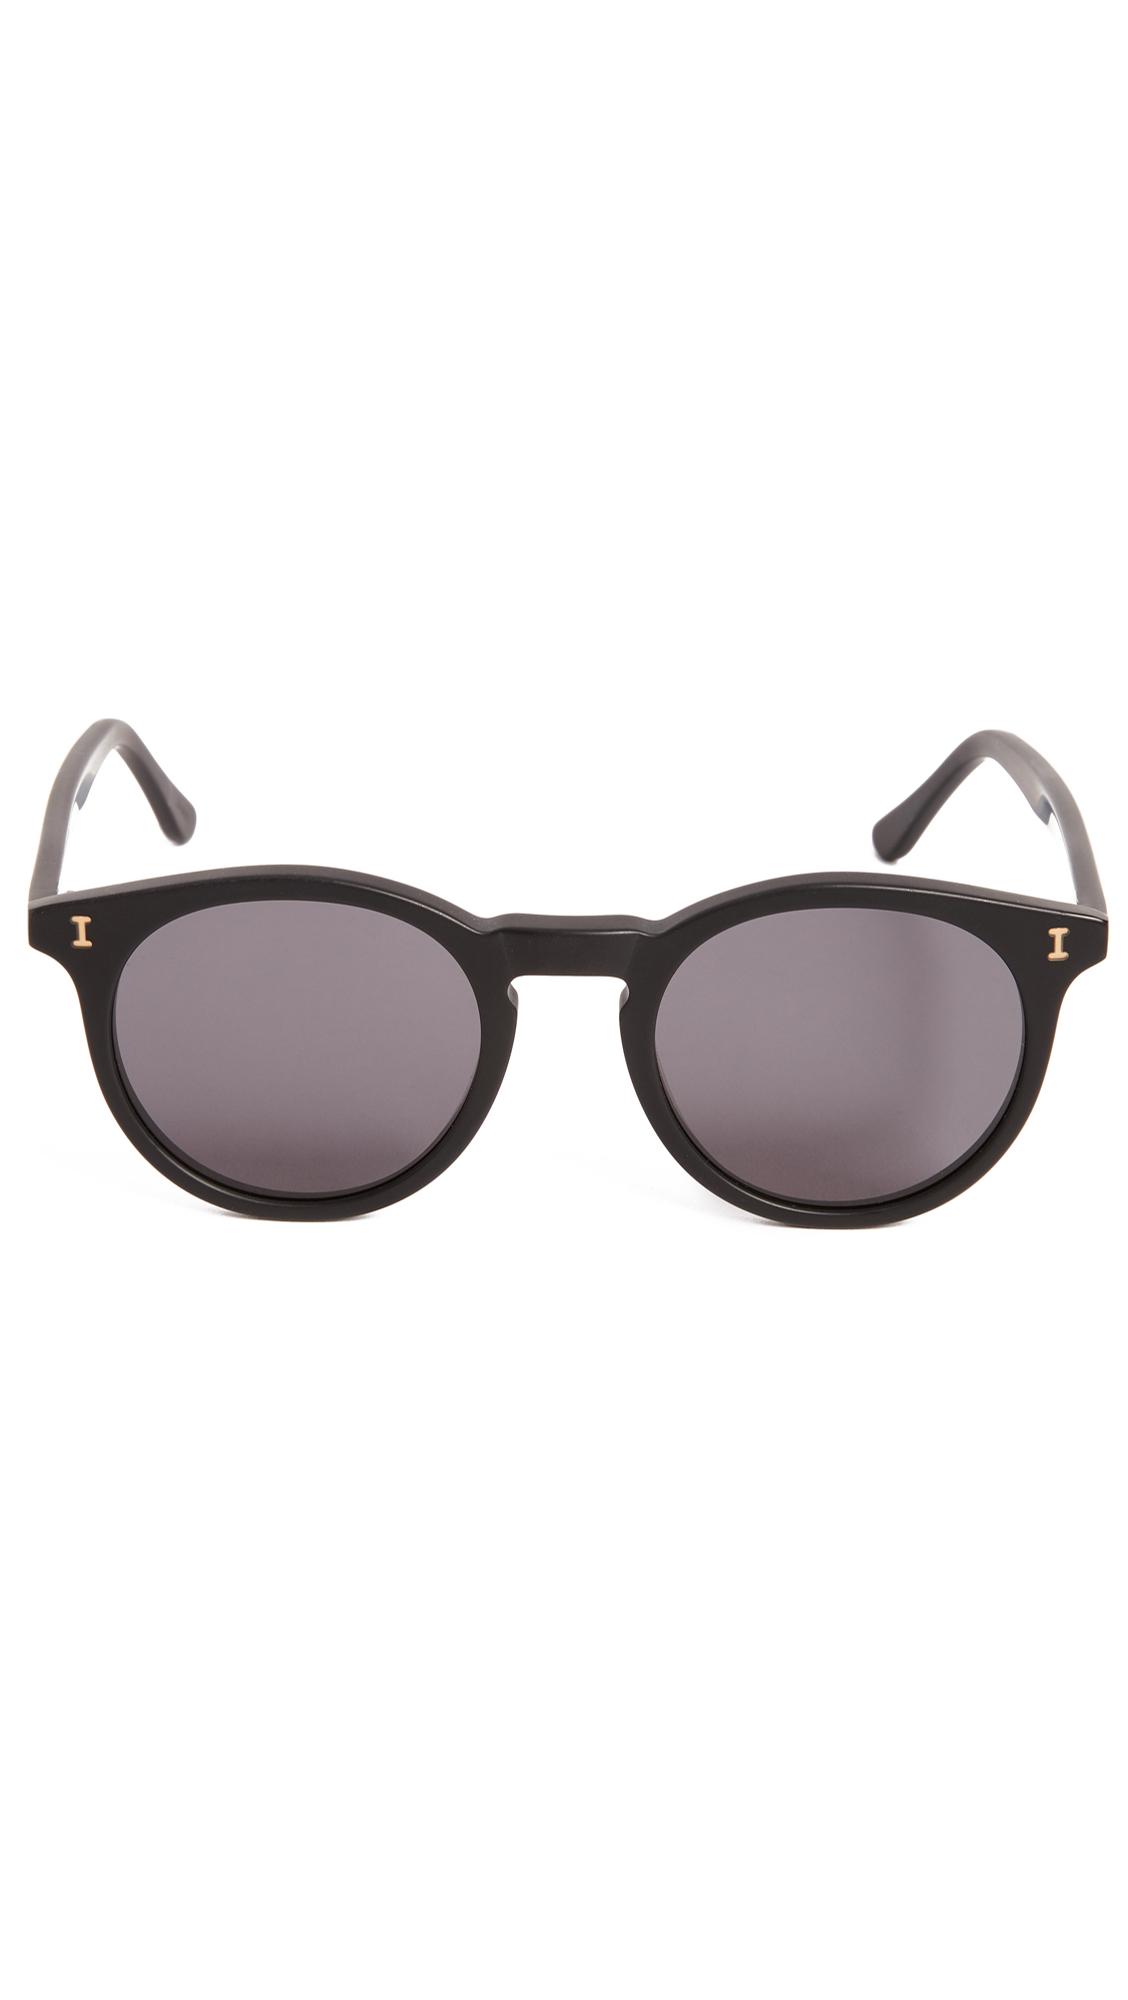 055a25a3c5 Illesteva Sterling Matte Black Sunglasses